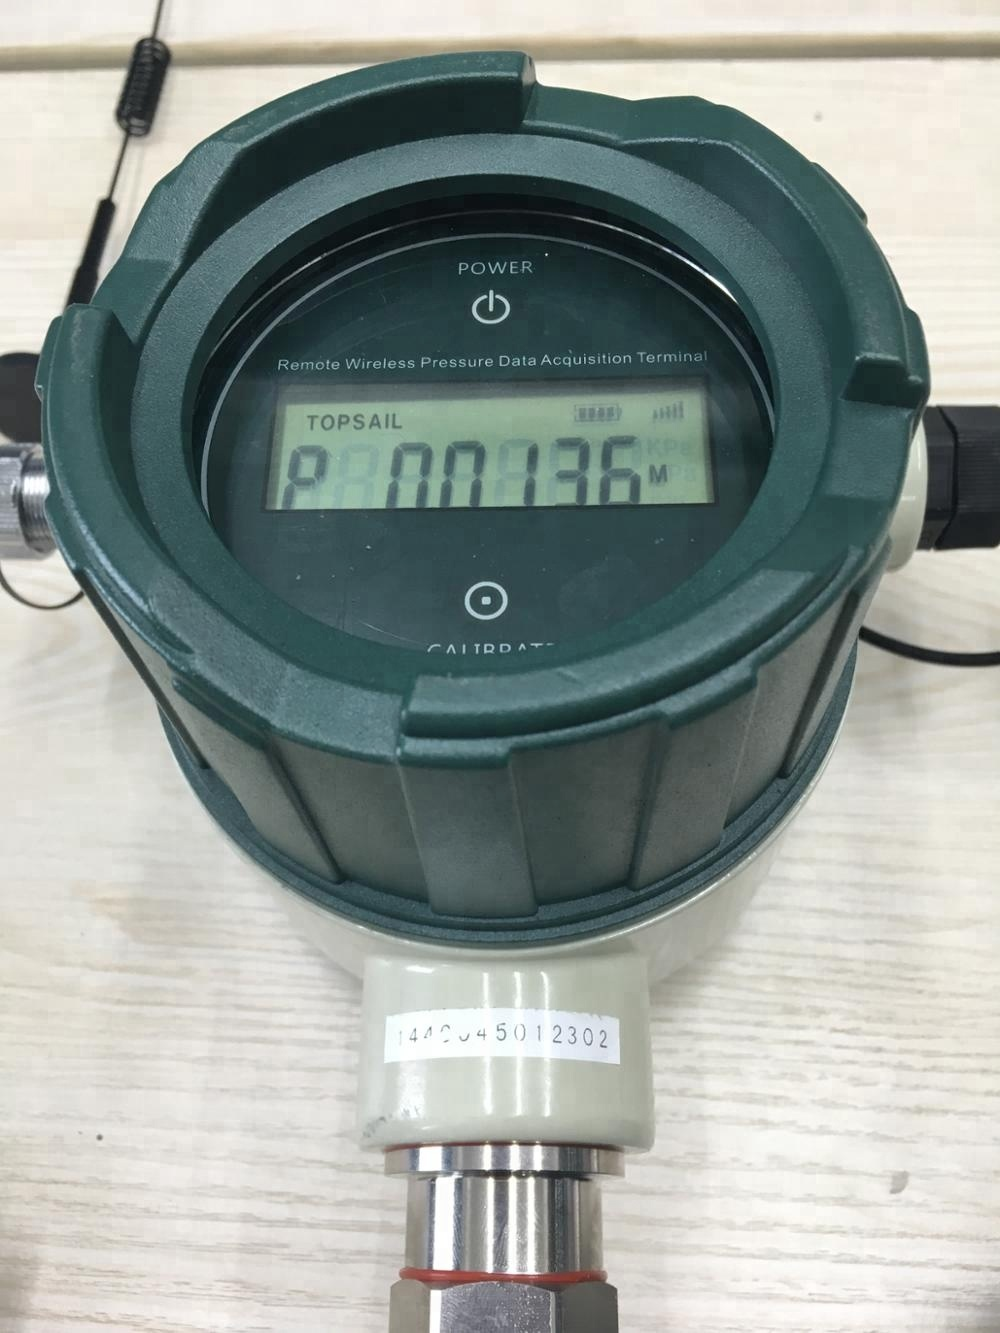 H119720ed501f4ed5b035abc61992b5c7k - NB-IOT Verified Internet of Things Device Water Tank Level Sensor